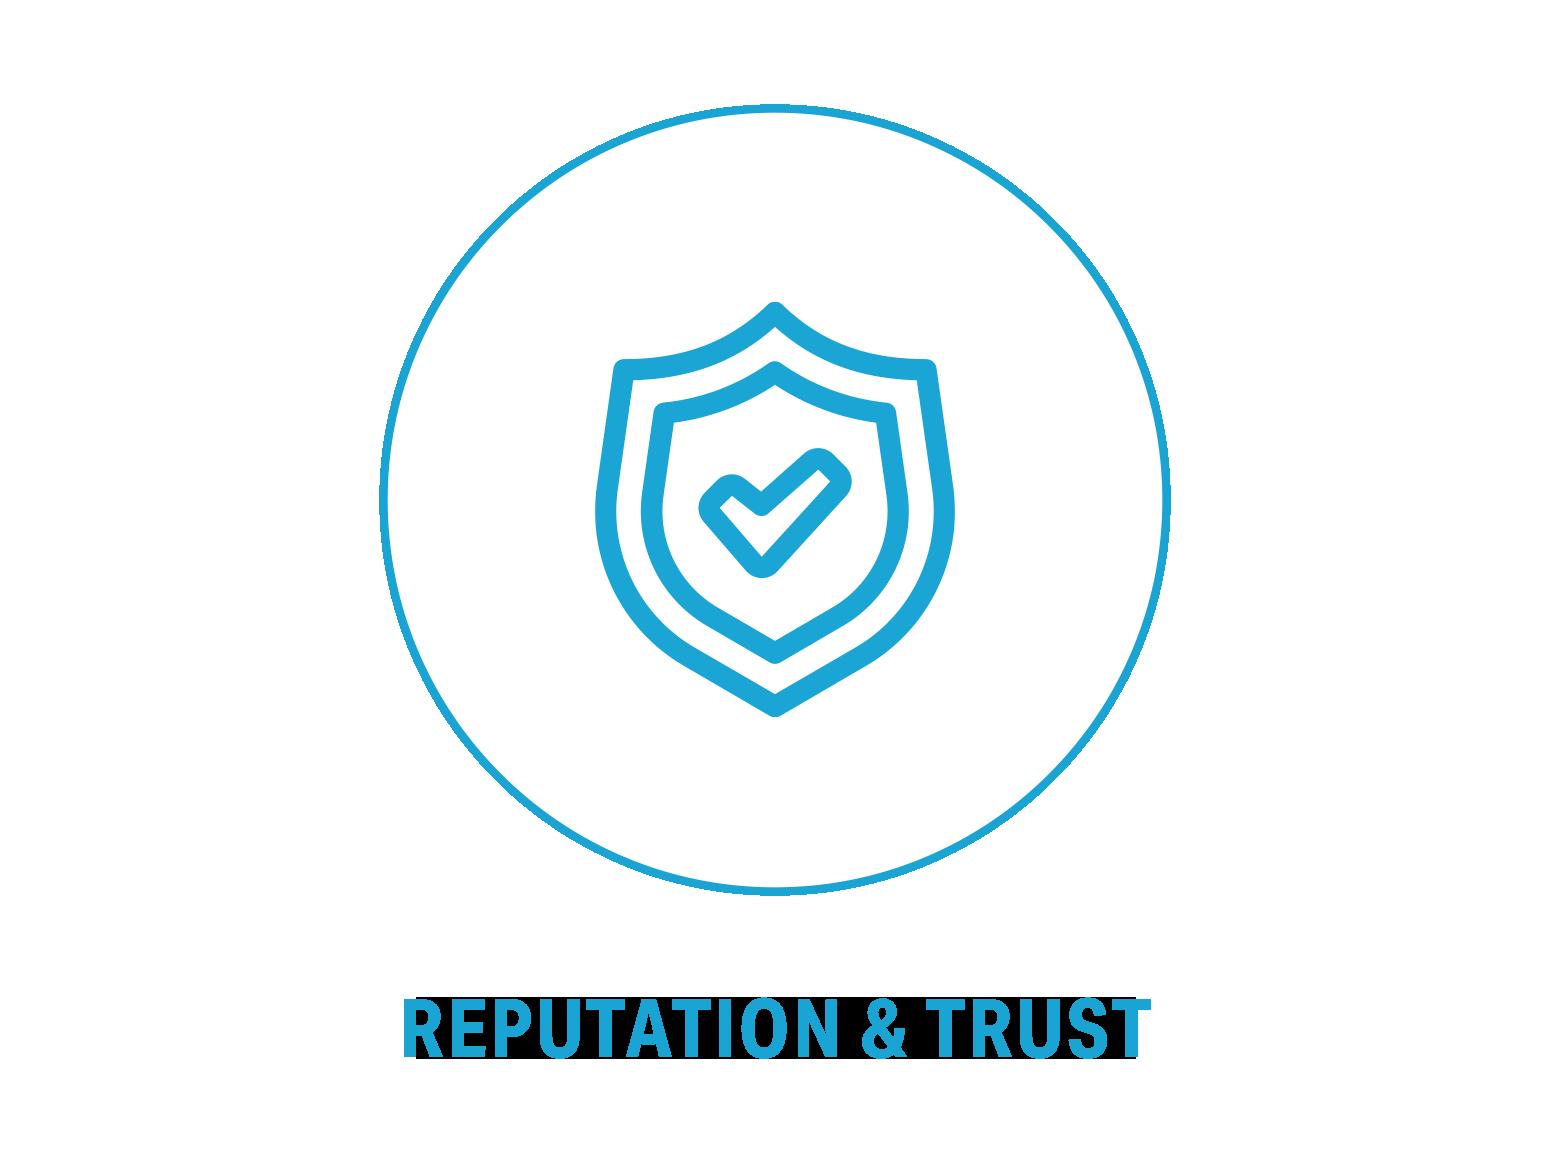 Reputation & Trust